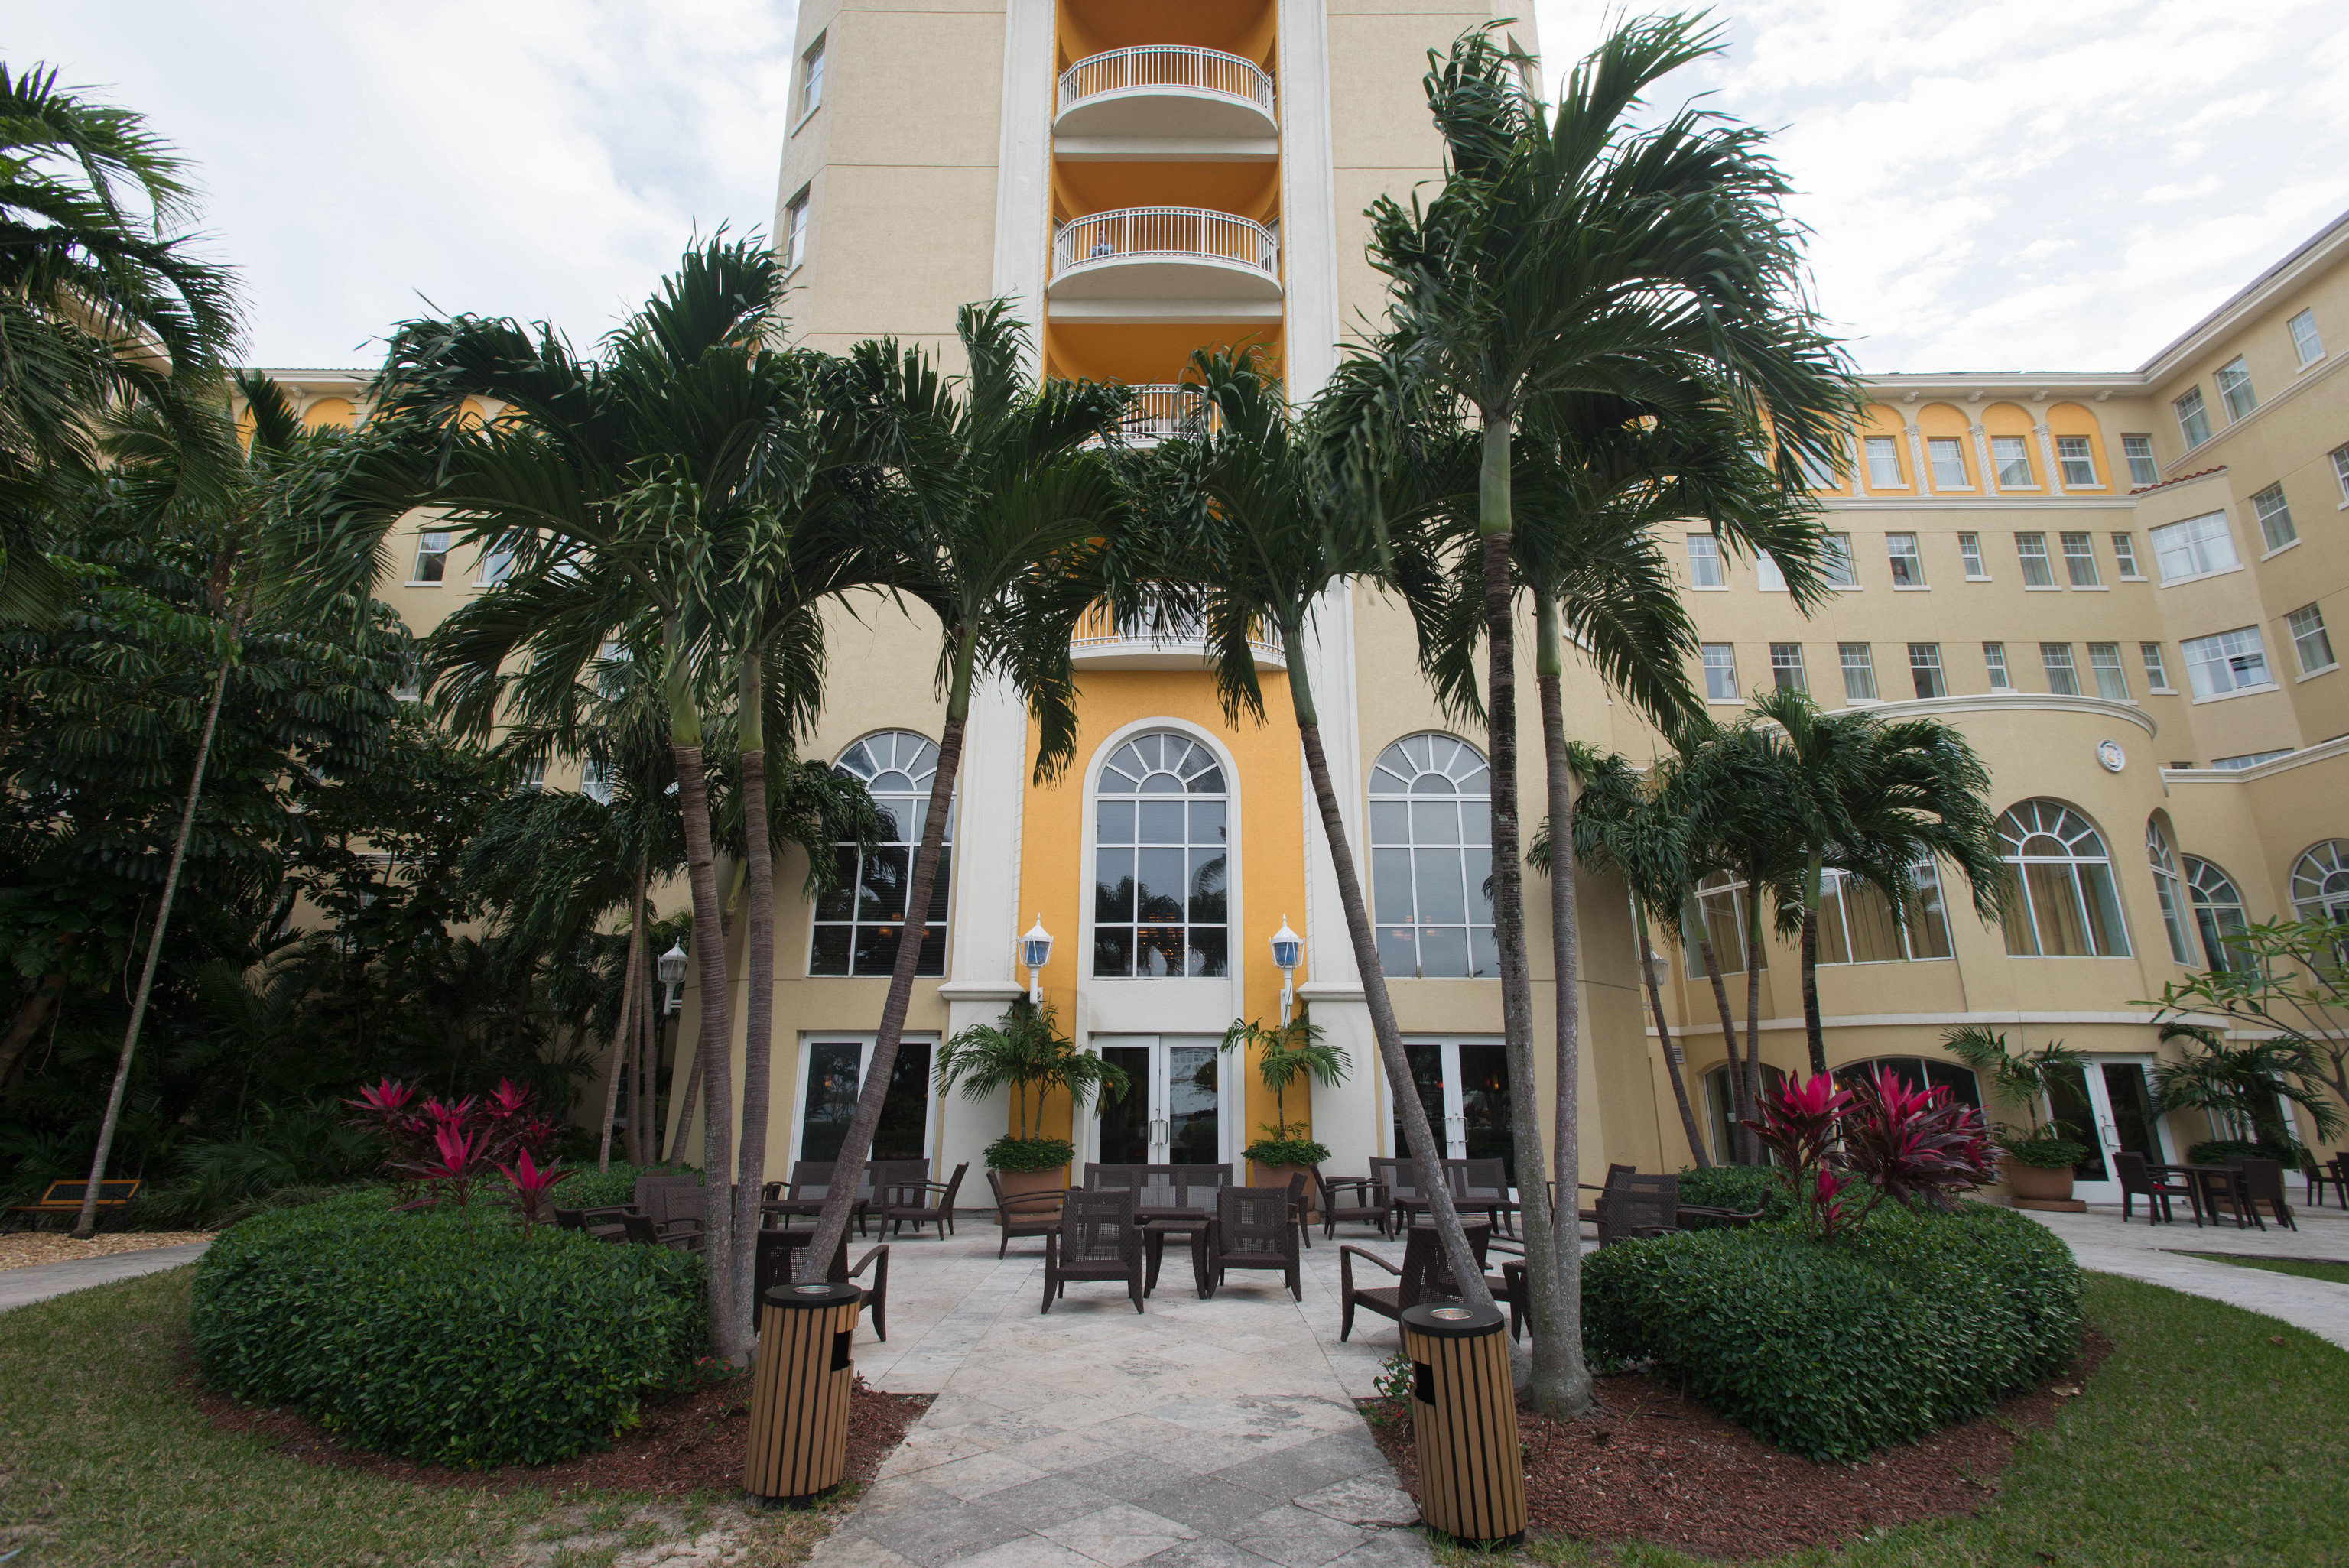 tree sky property building plaza Town neighbourhood house Courtyard Resort condominium hacienda Villa mansion palace plant